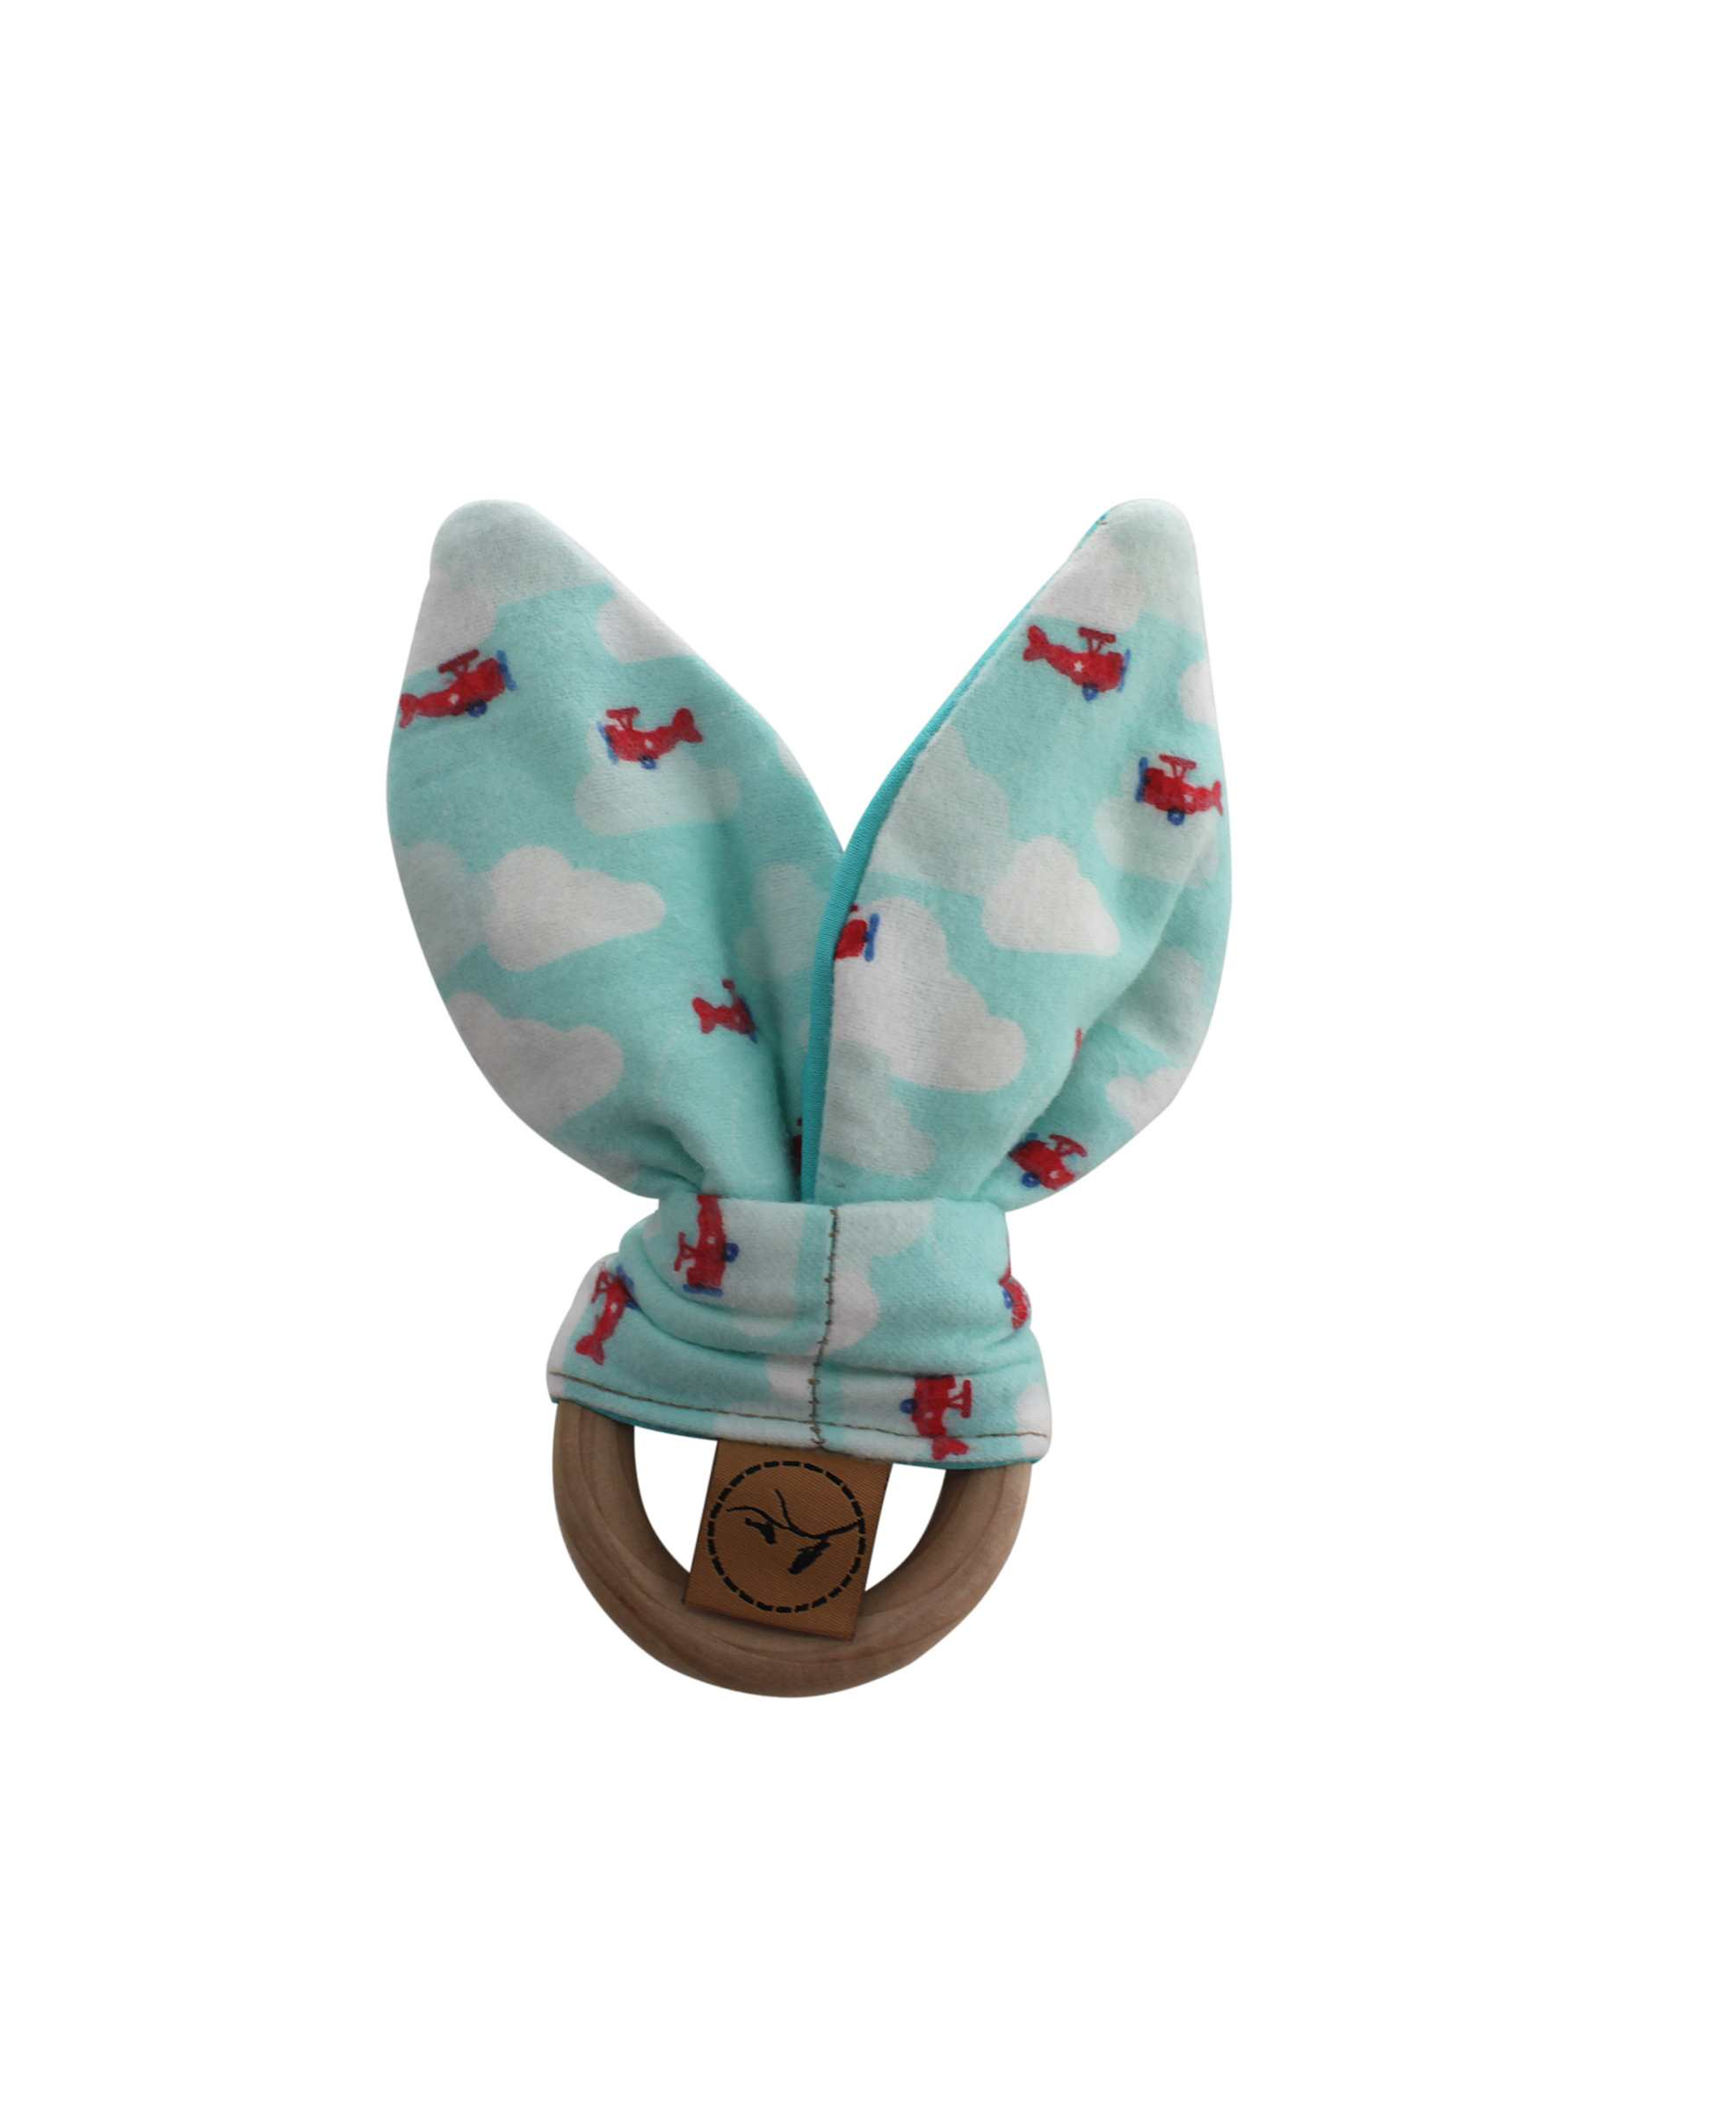 aero-baby-teether-wooden-bunny-jaw-development